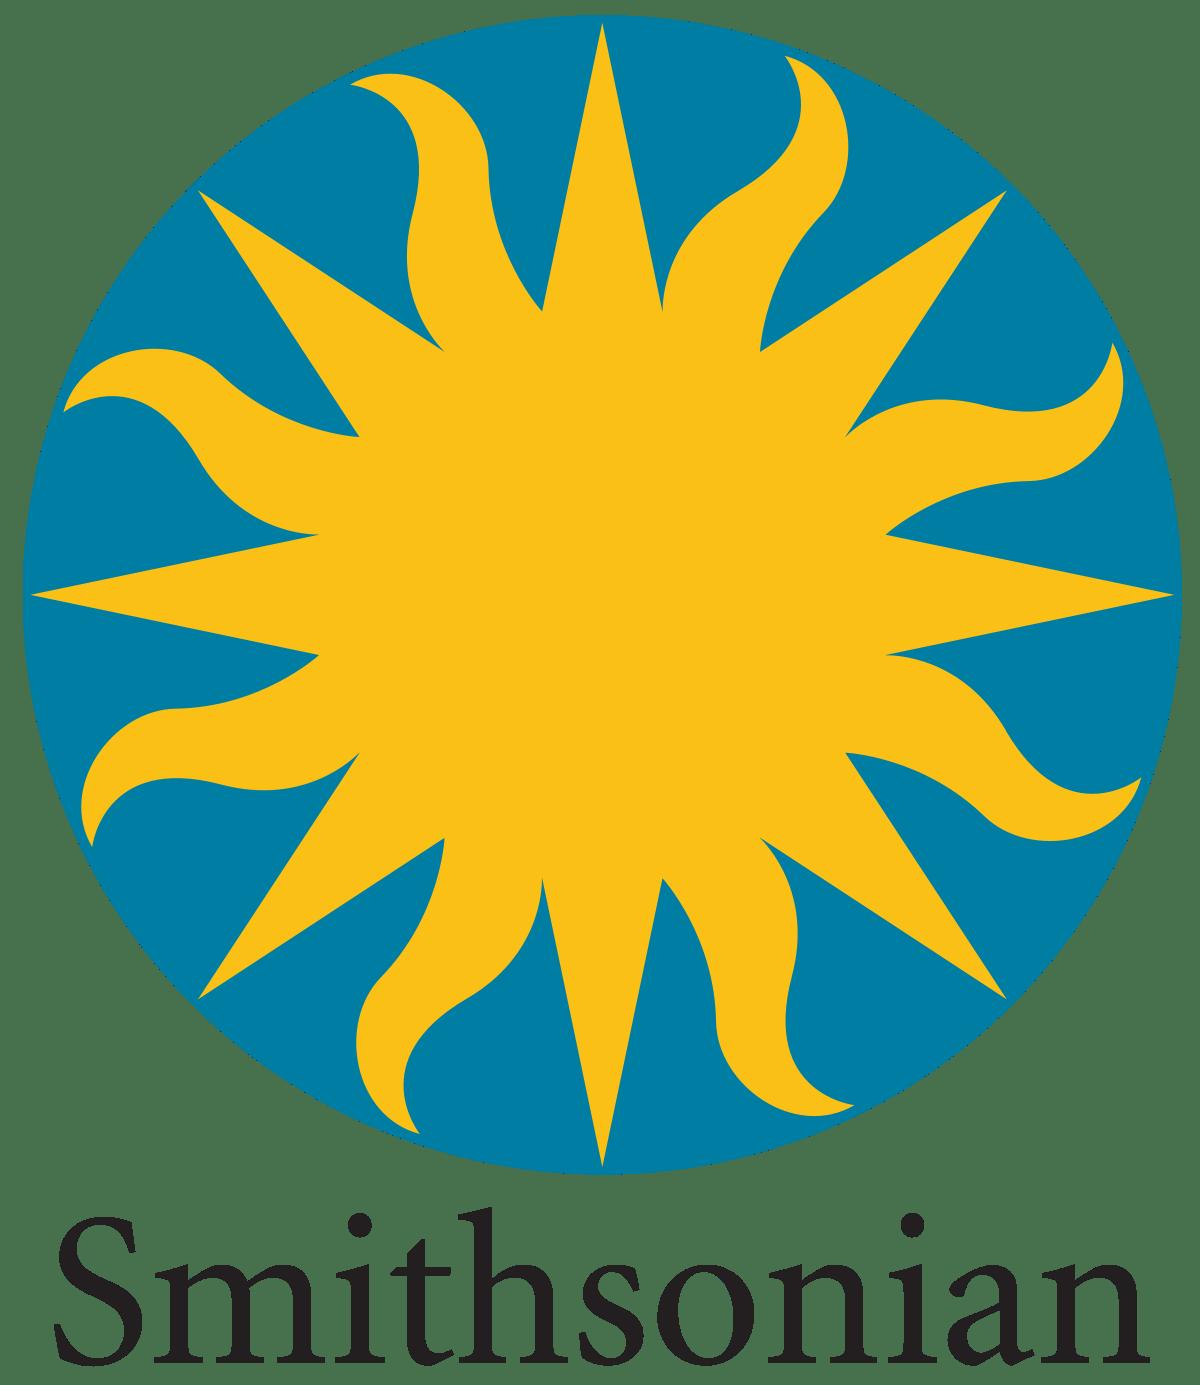 The Smithsonian Institution Fellowship Program